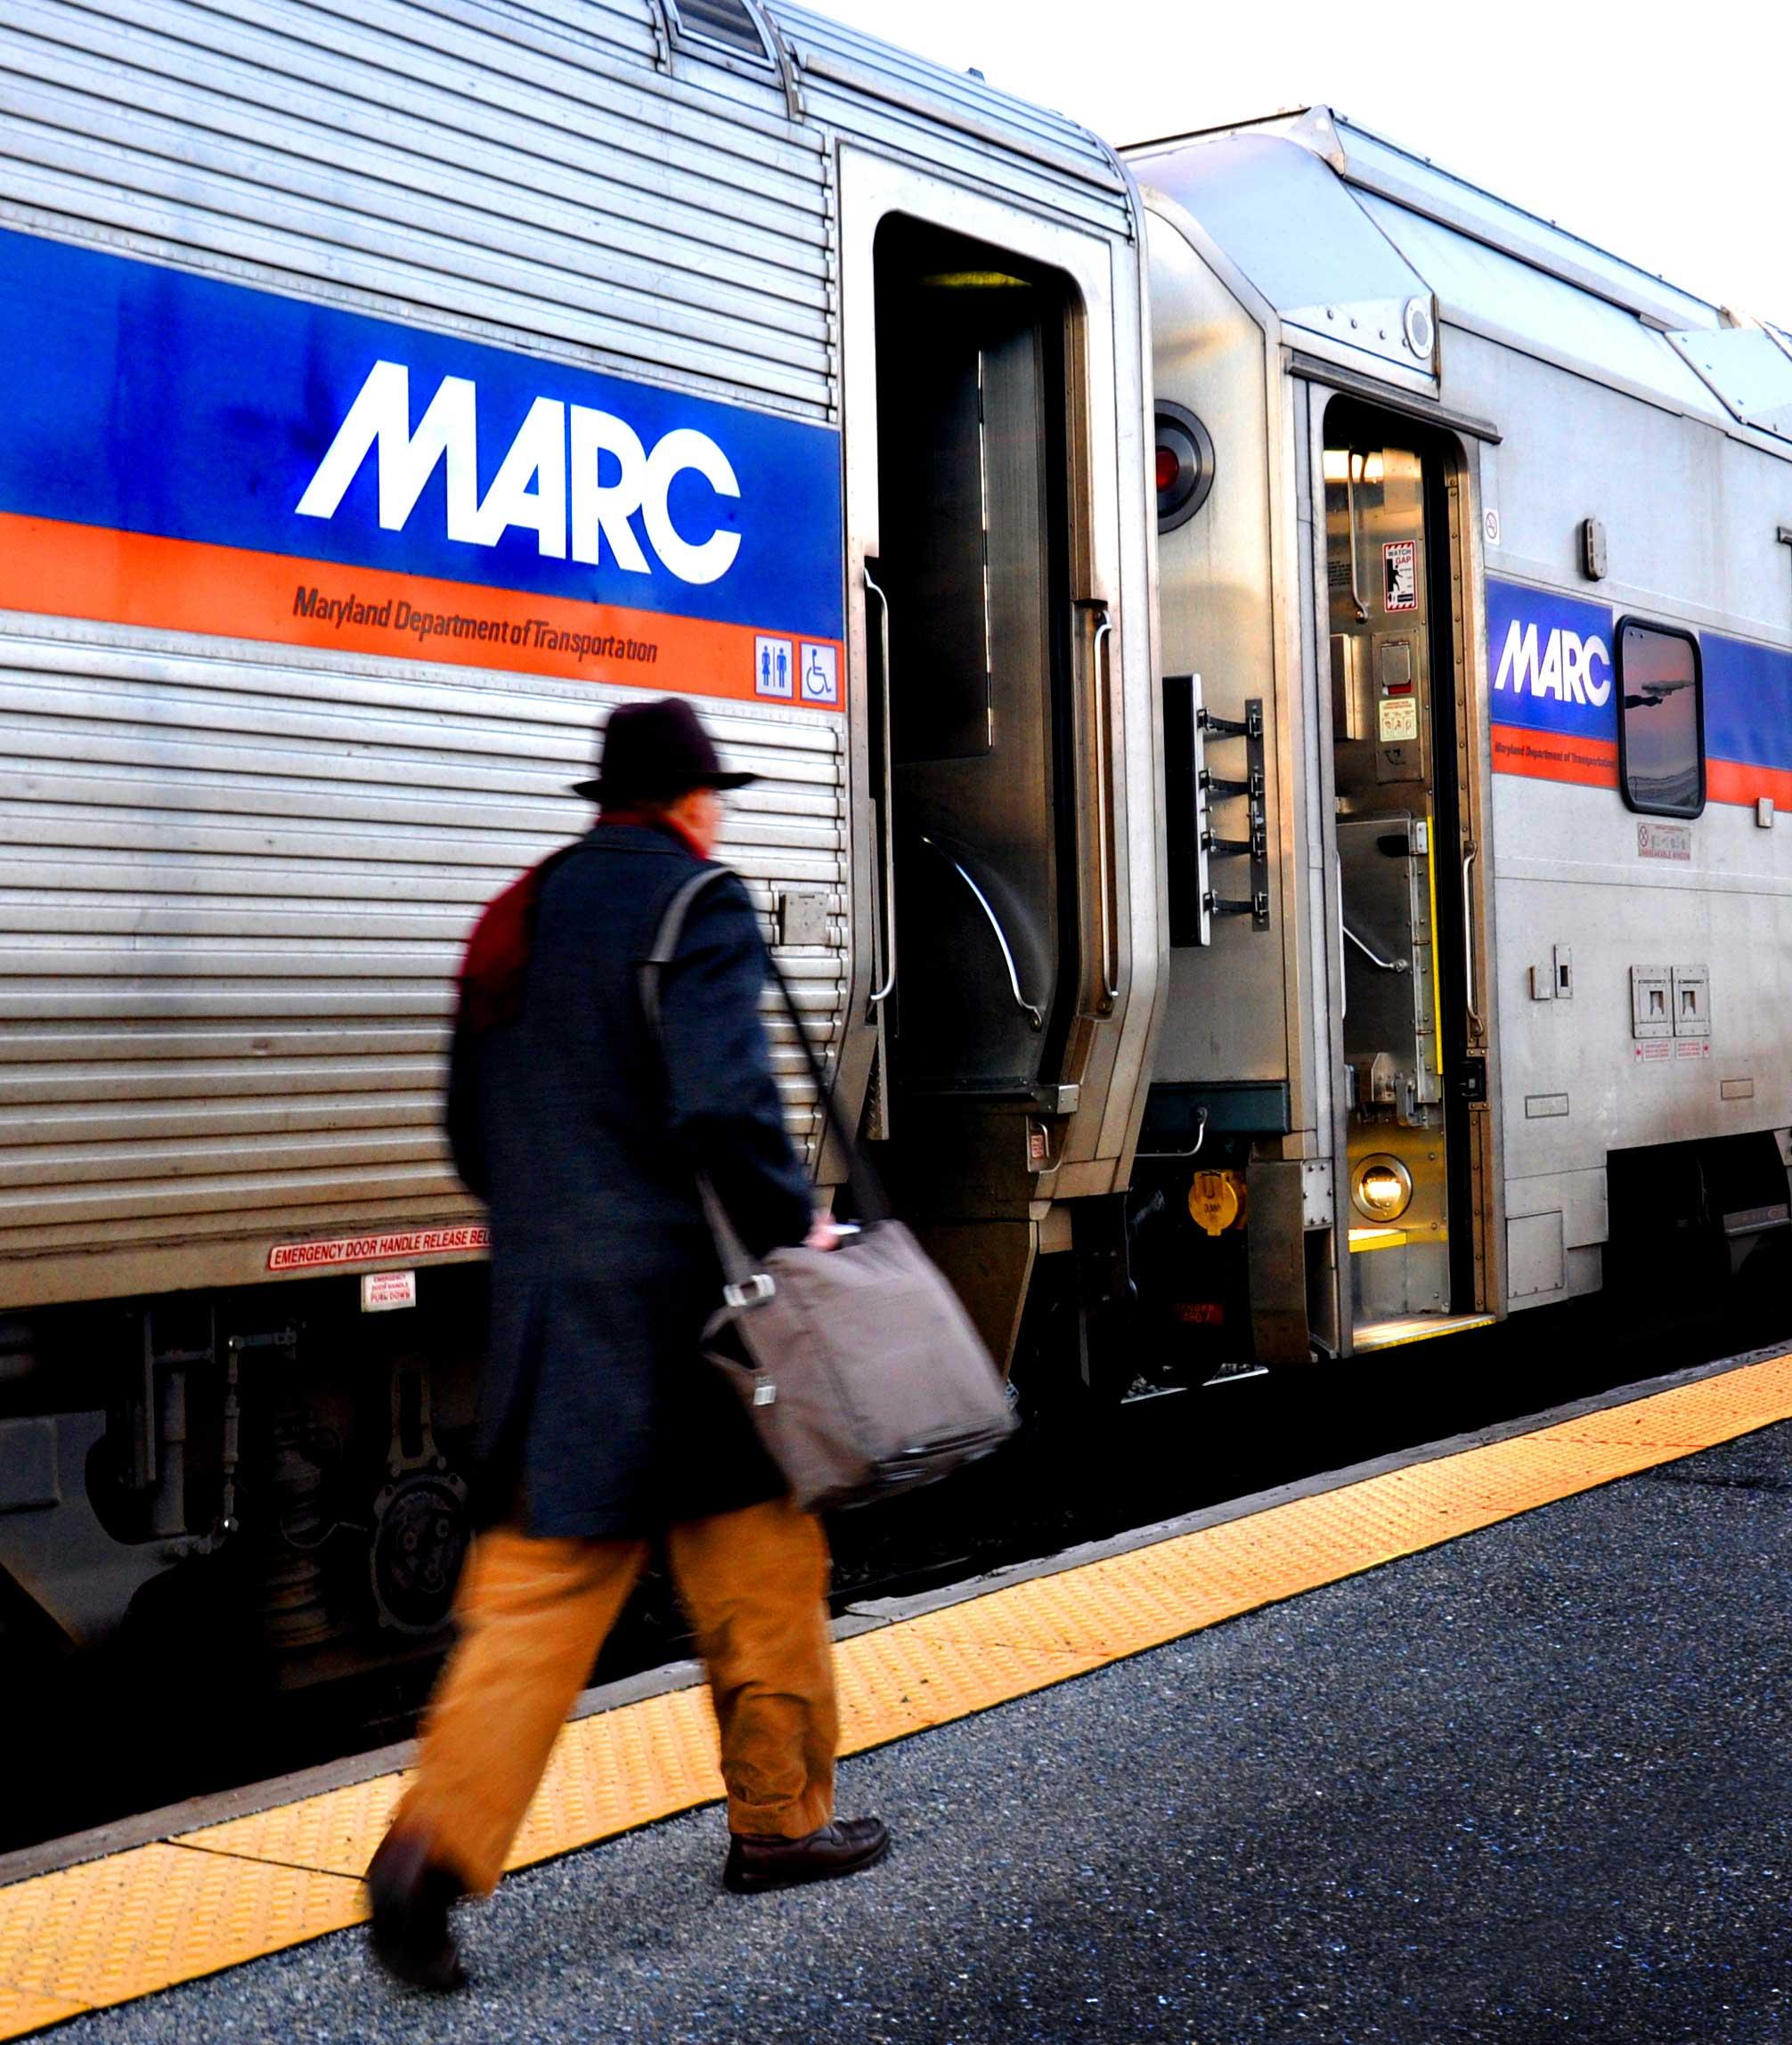 Brunswick Crossing New Homes are near the MARC Train to Washington DC Rockville Bethesda Maryland